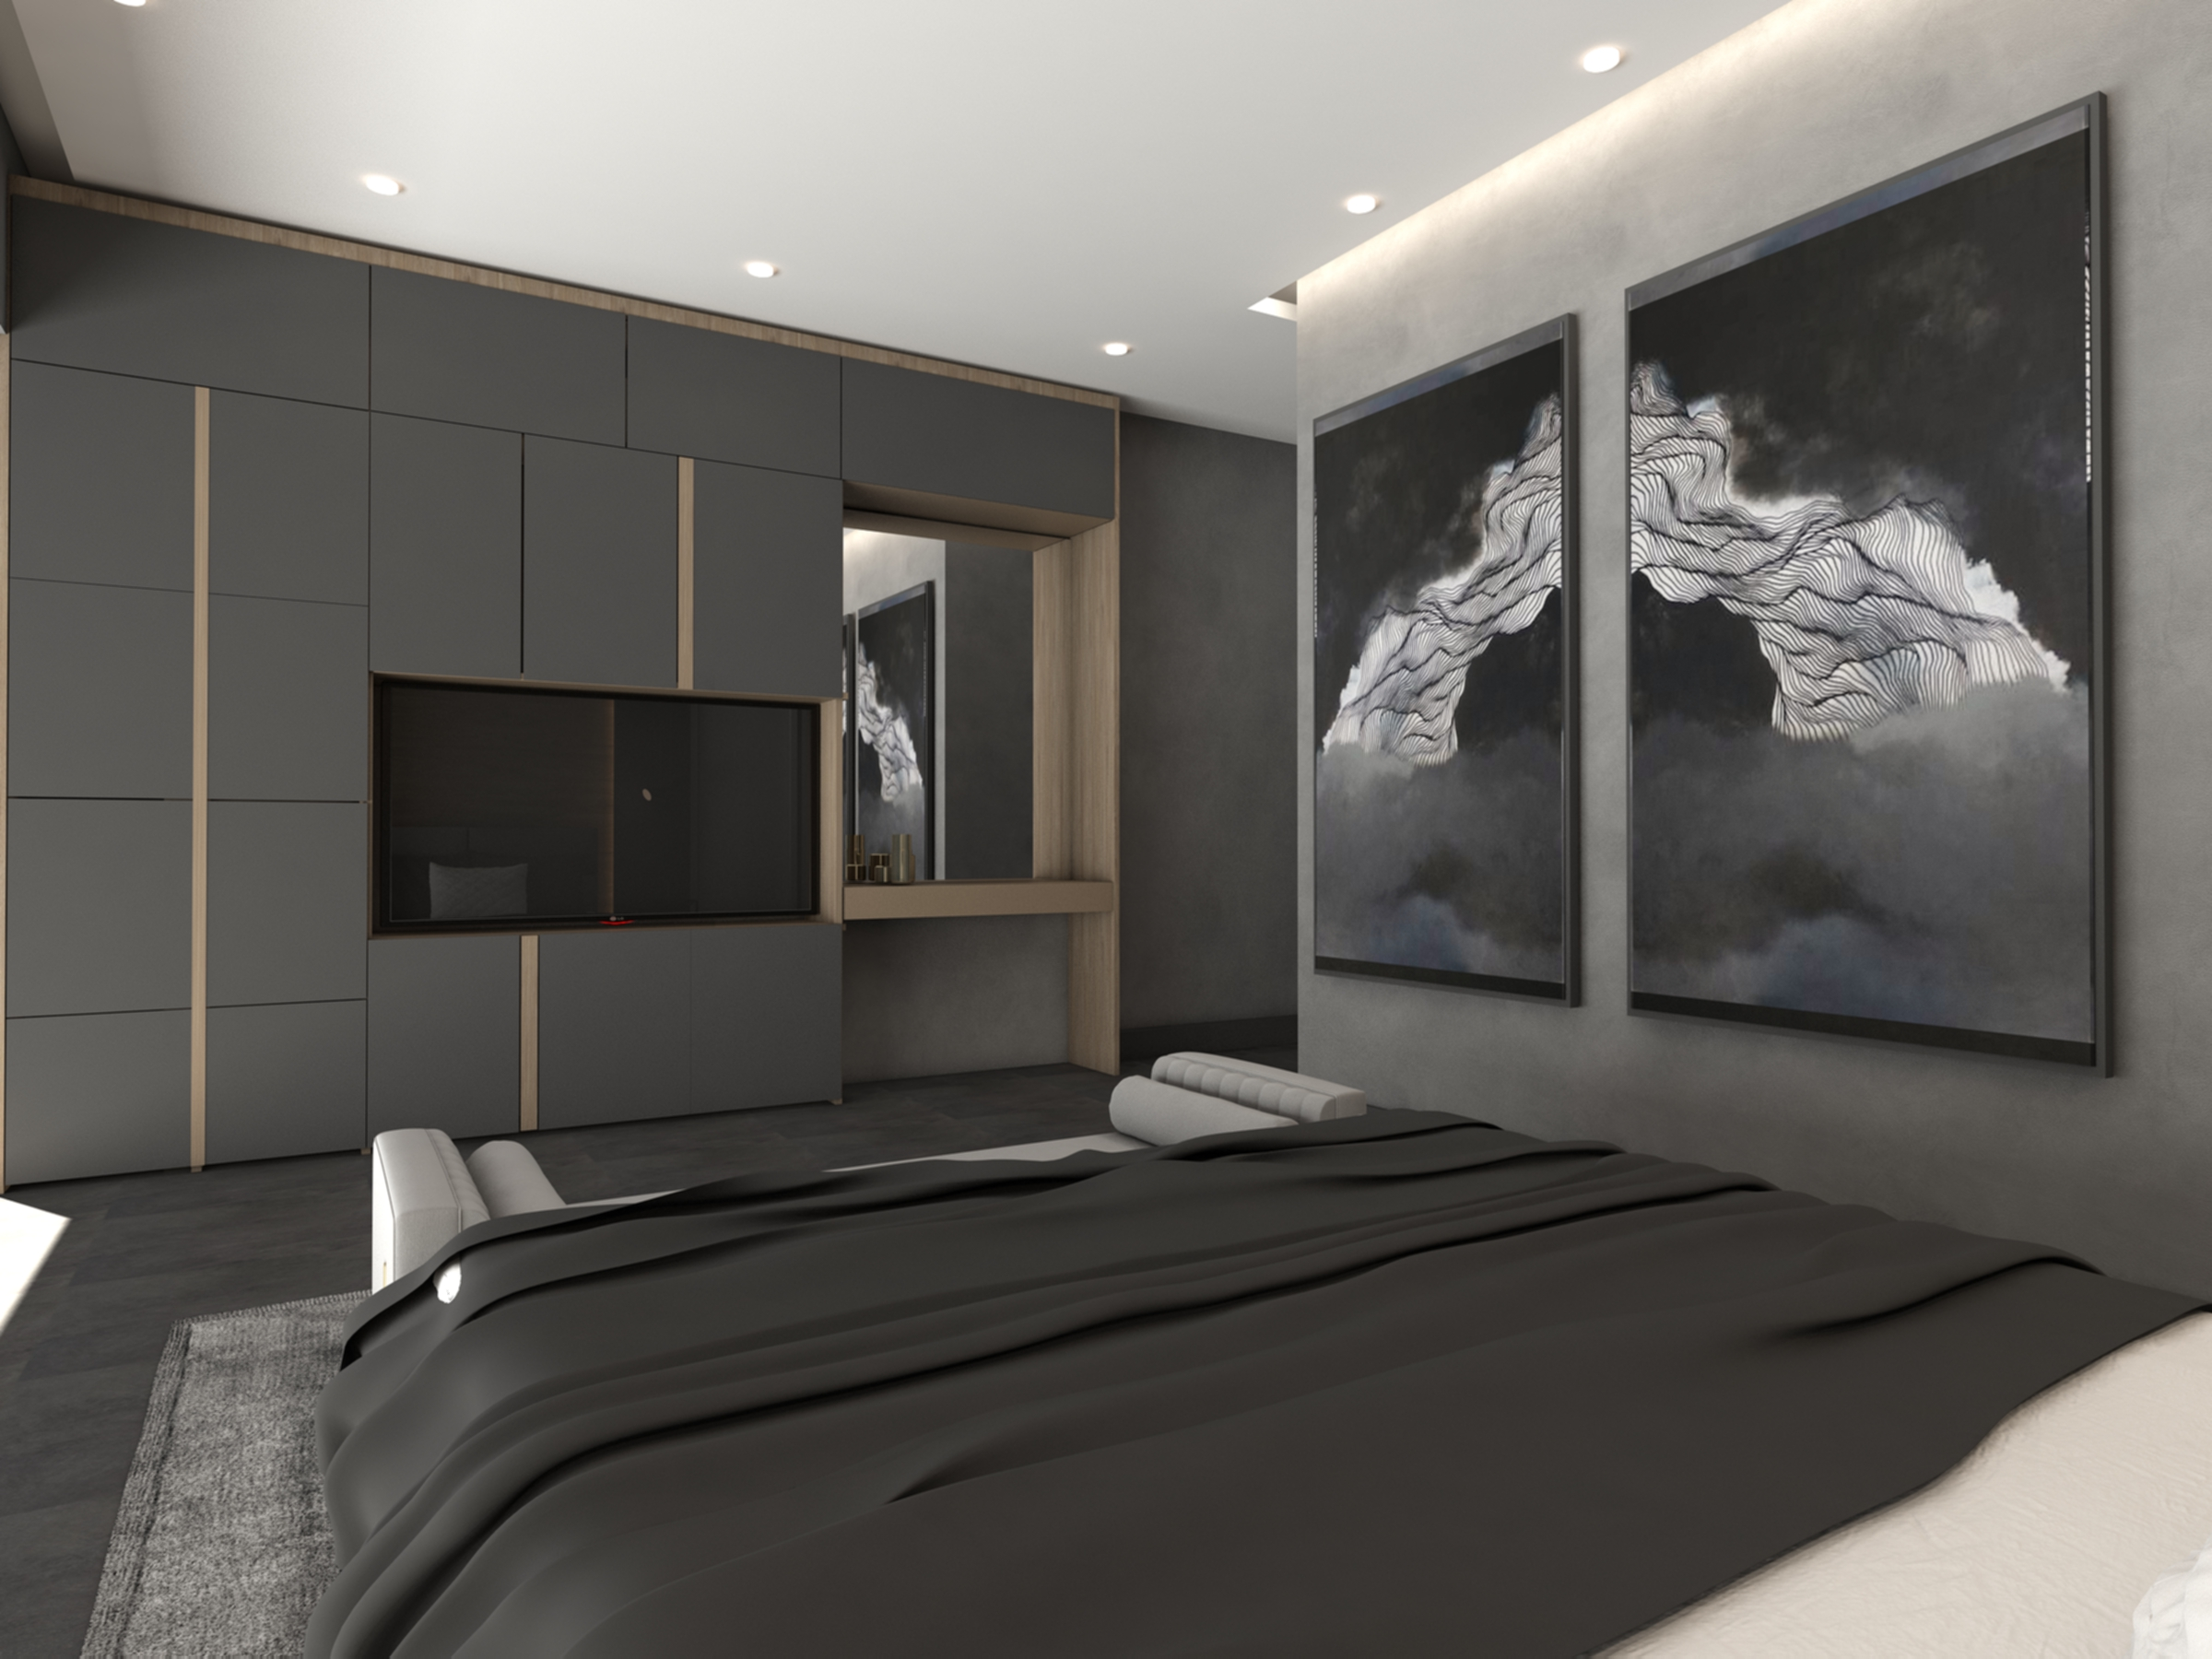 Upper Master Bedroom: Penthouse Apartment for Sale at Baraka Residence in Nyarutarama, Kigali